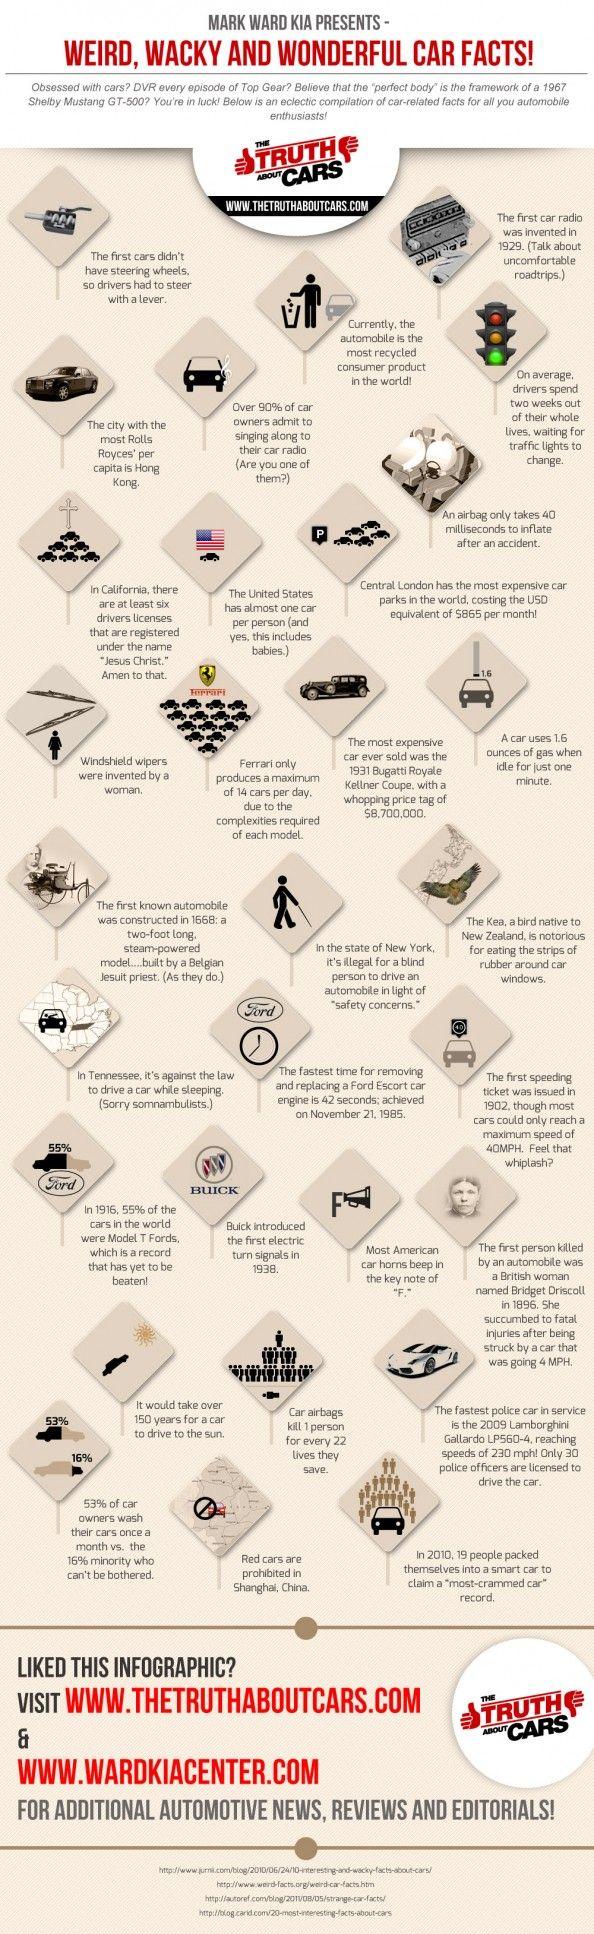 Weird, Wacky and Wonderful #Car Facts via @David Nilsson Horton #Infographic